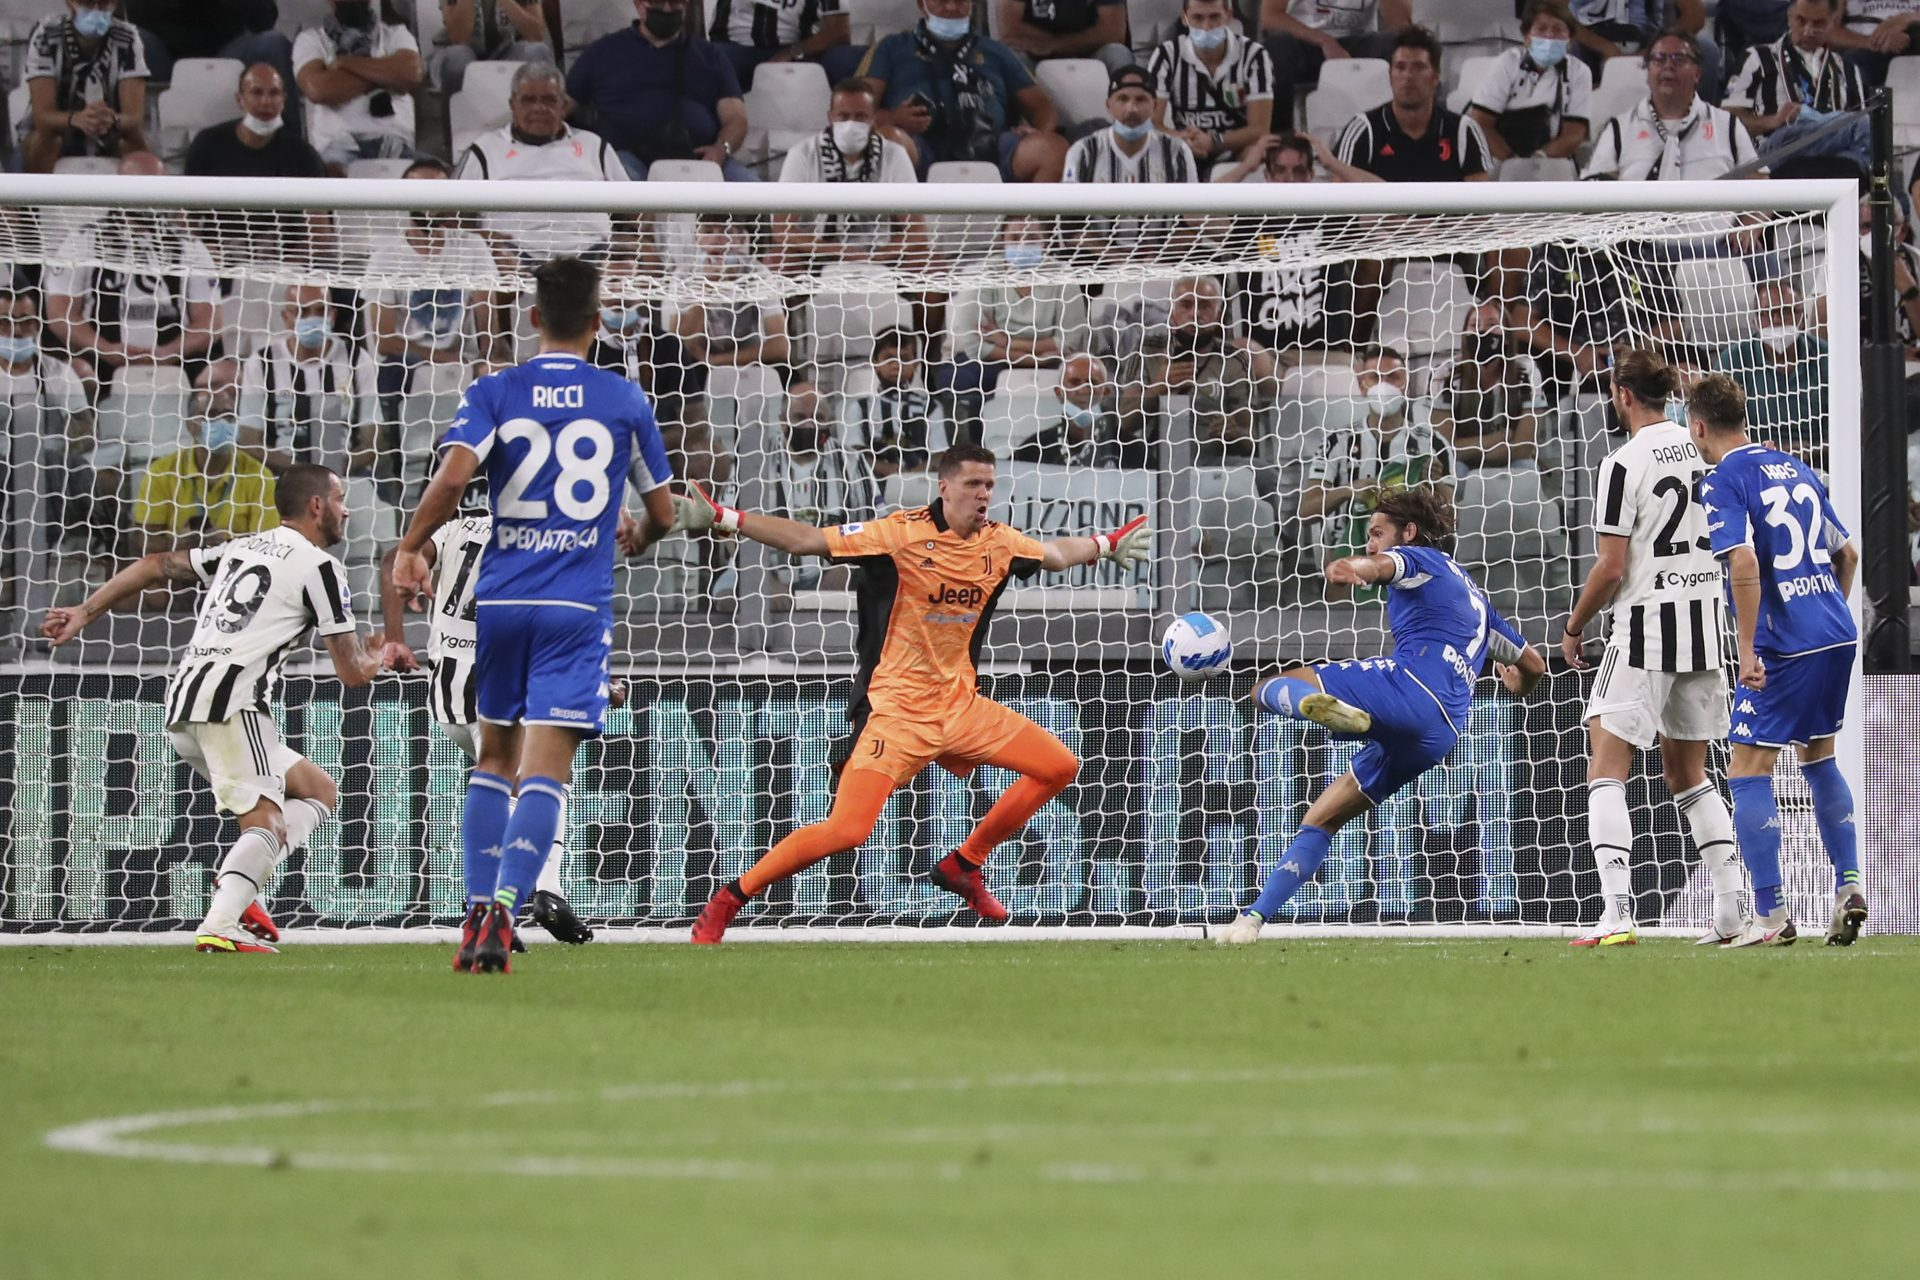 Leonardo Mancuso of Empoli scores the only goal to start Juventus' season off with a home defeat. Credit: Giuseppe Cottini/NurPhoto/Getty